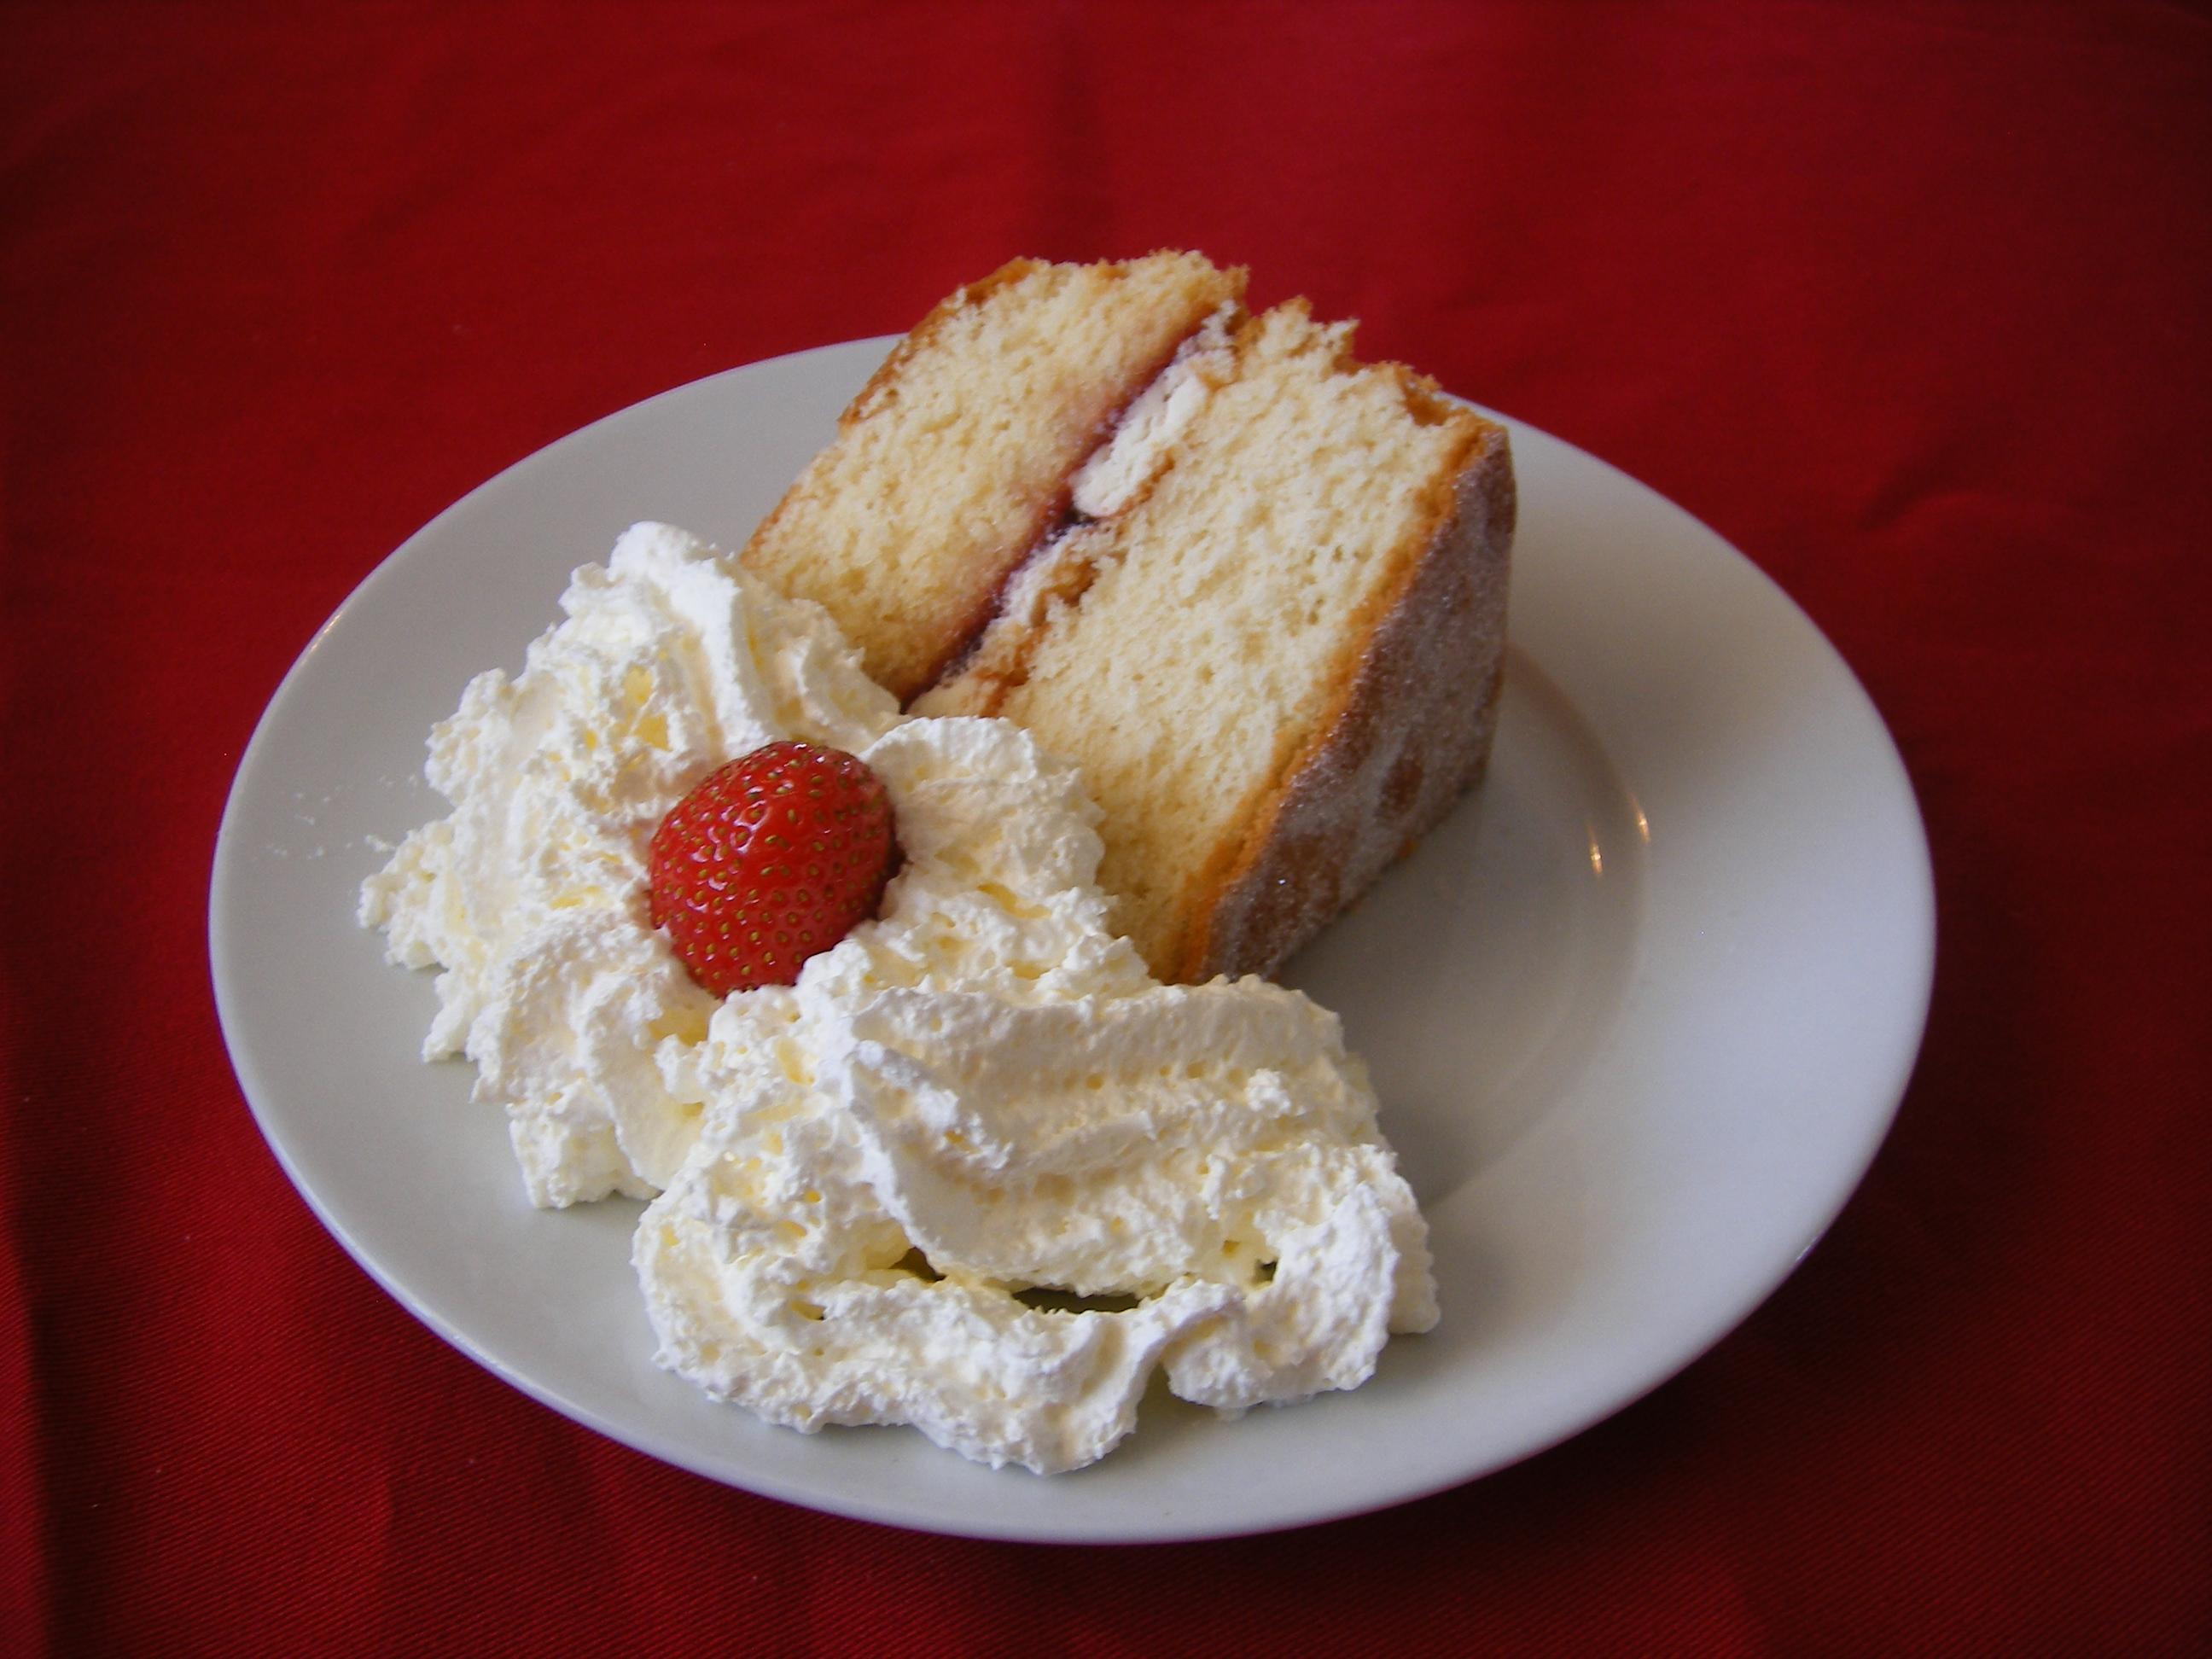 Recette De Cake Pops Au Chocolat Et M Ef Bf Bdttre Au Frigo